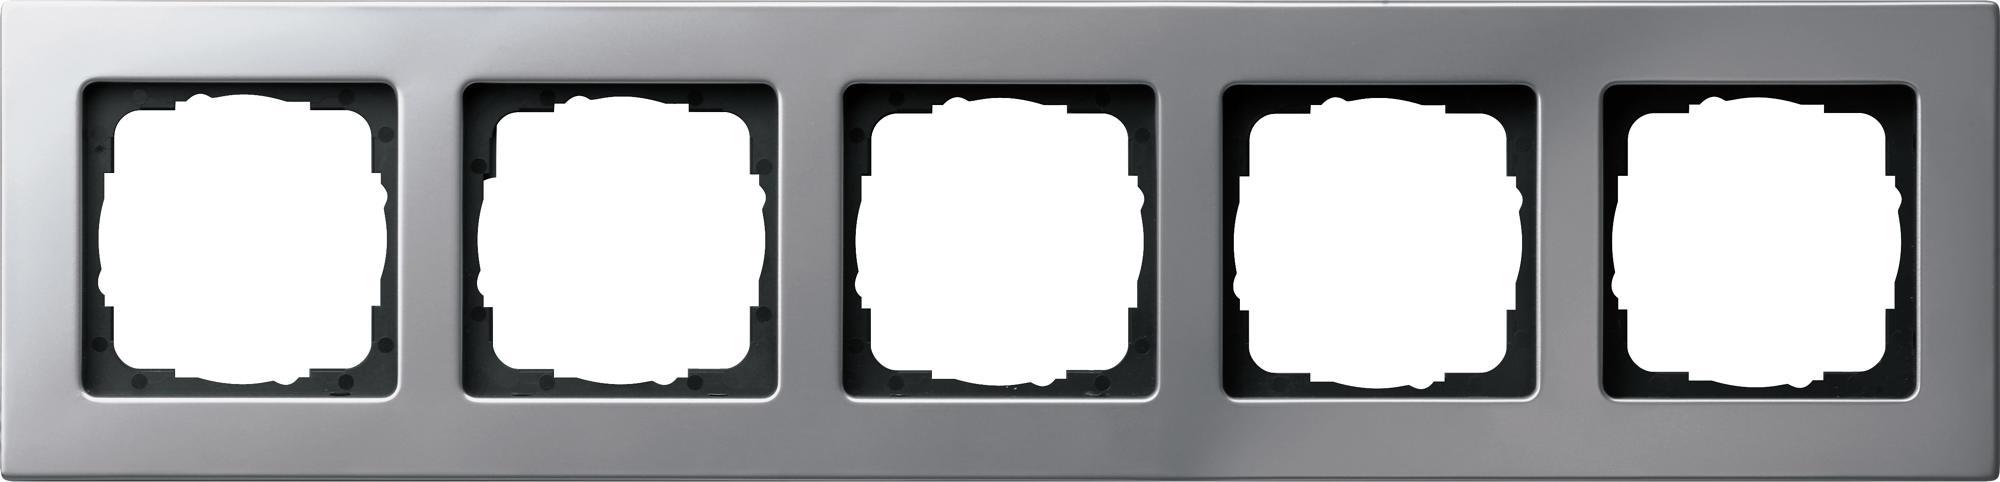 abdeckrahmen gira e22 aluminium 5fach von gira bei elektroshop wagner. Black Bedroom Furniture Sets. Home Design Ideas